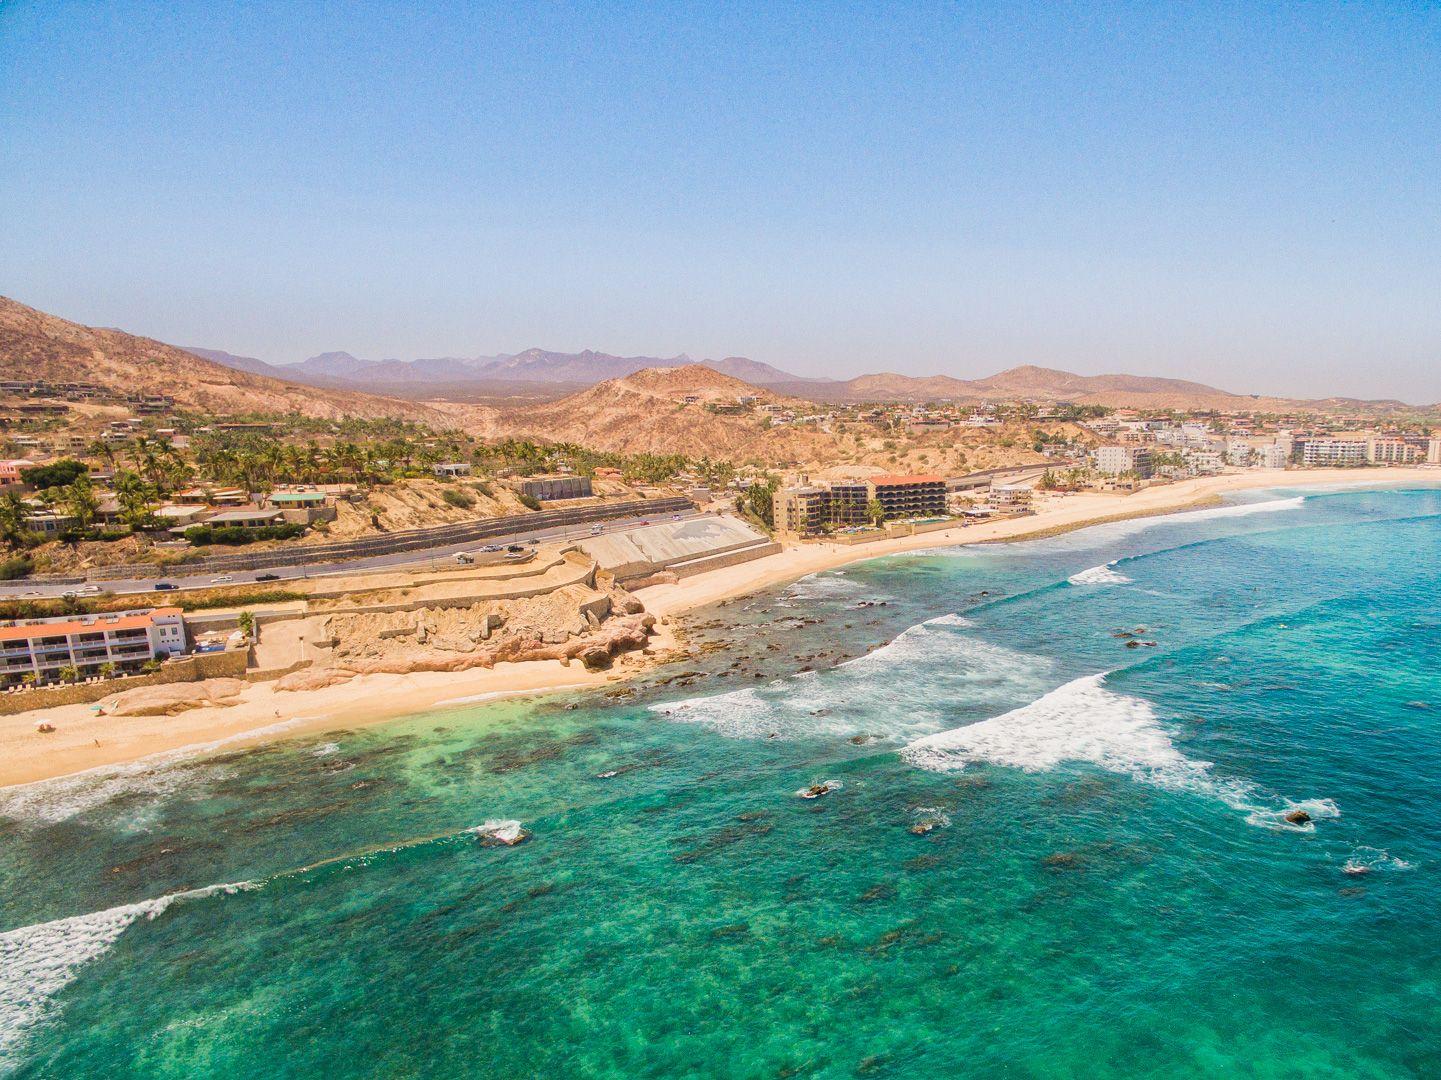 Costa Azul Beach | Baja california sur, Baja california, Beach